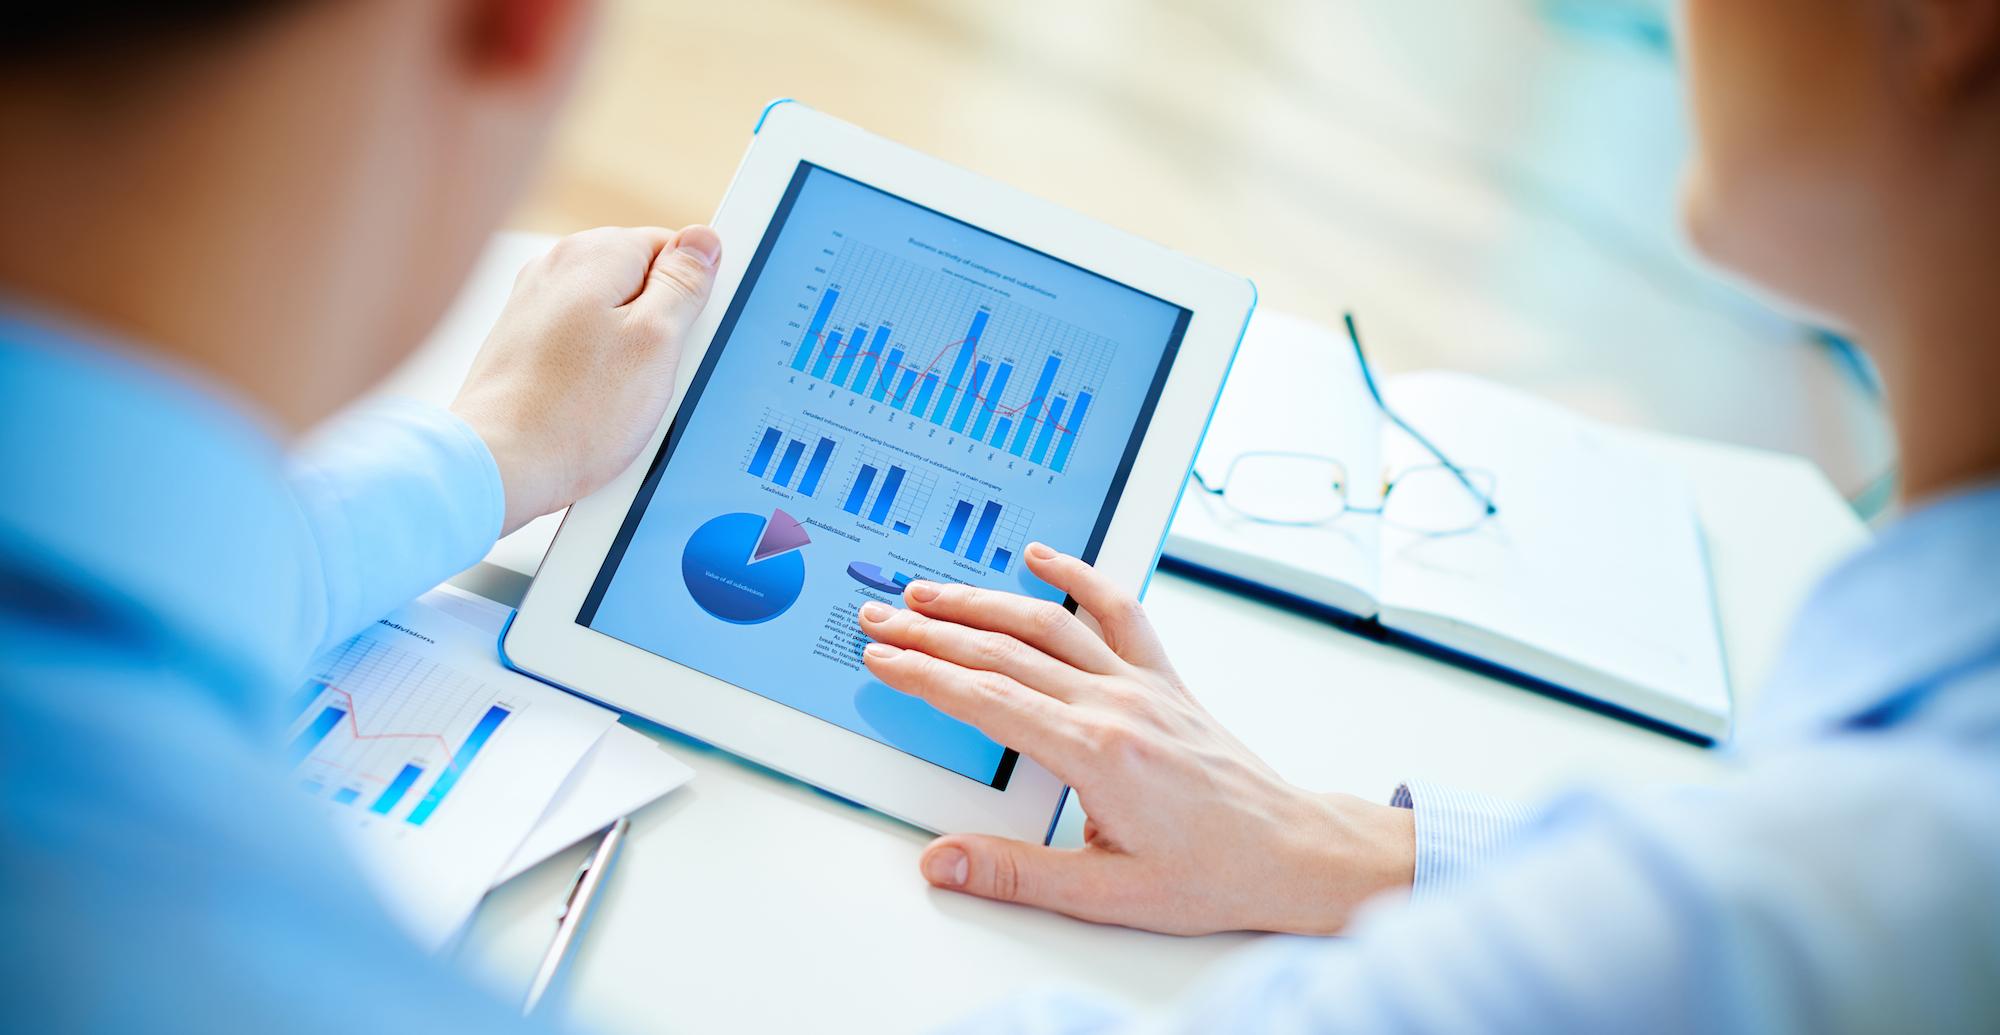 Business Information For Progress & Development